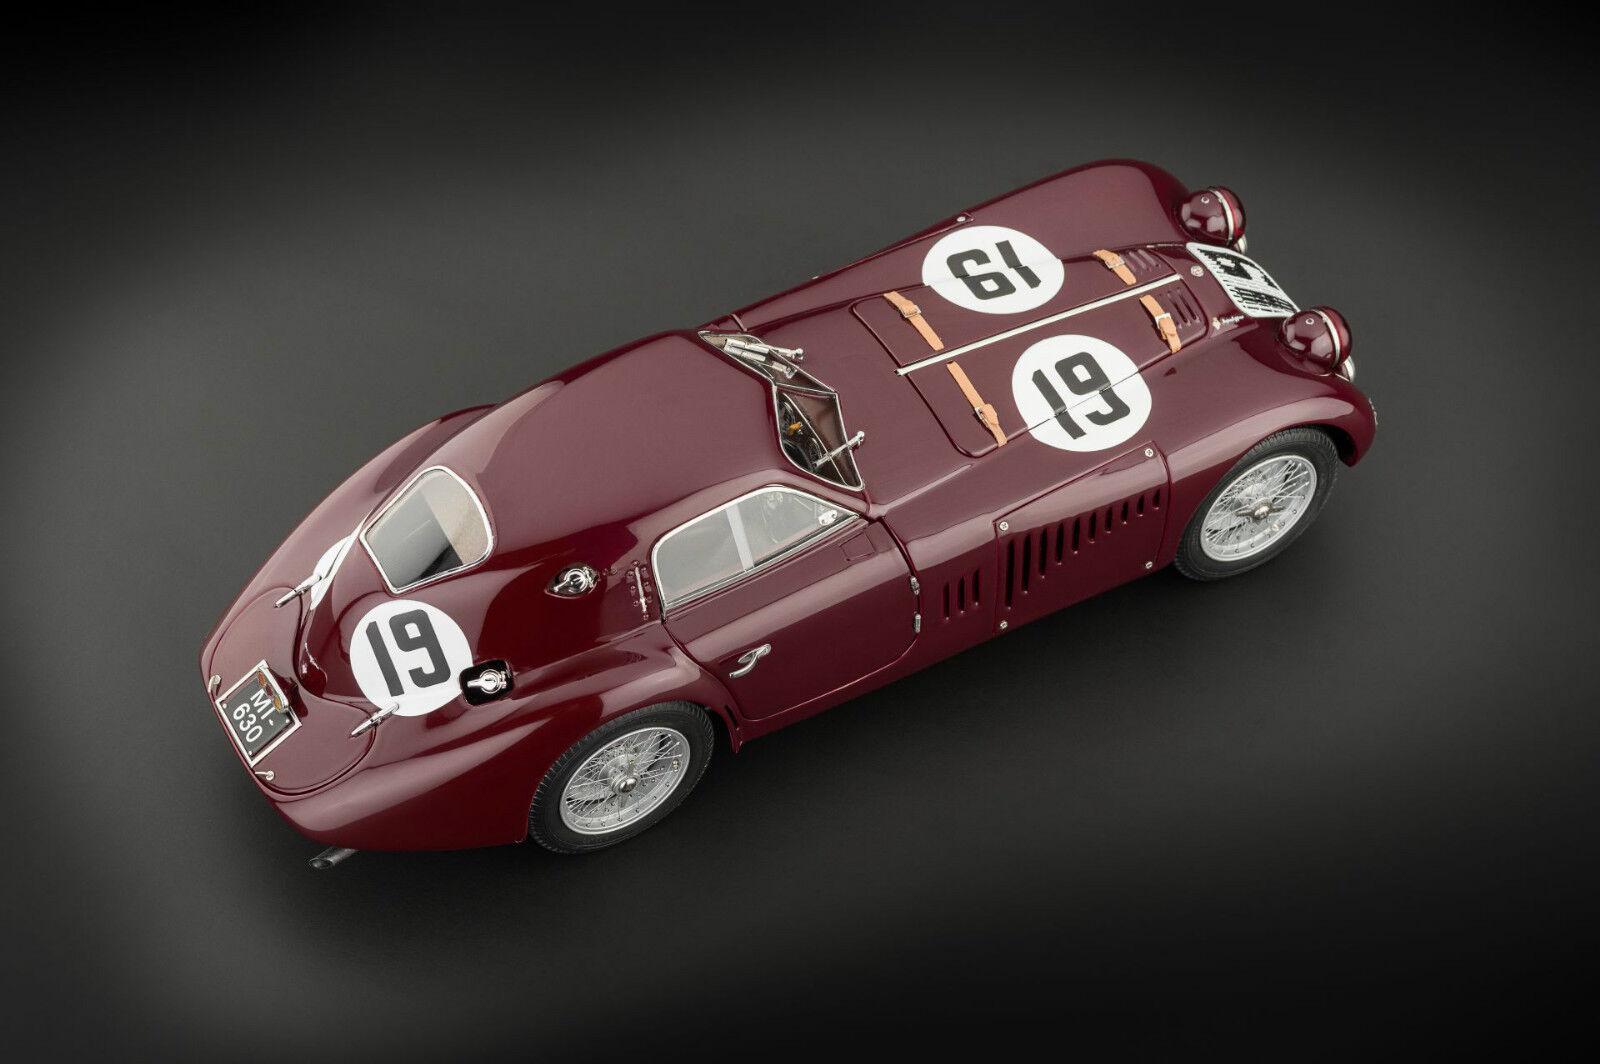 Alfa Romeo 8 C 2900b  19 24 H le mans CMC m-111 1 18 neu&ovp